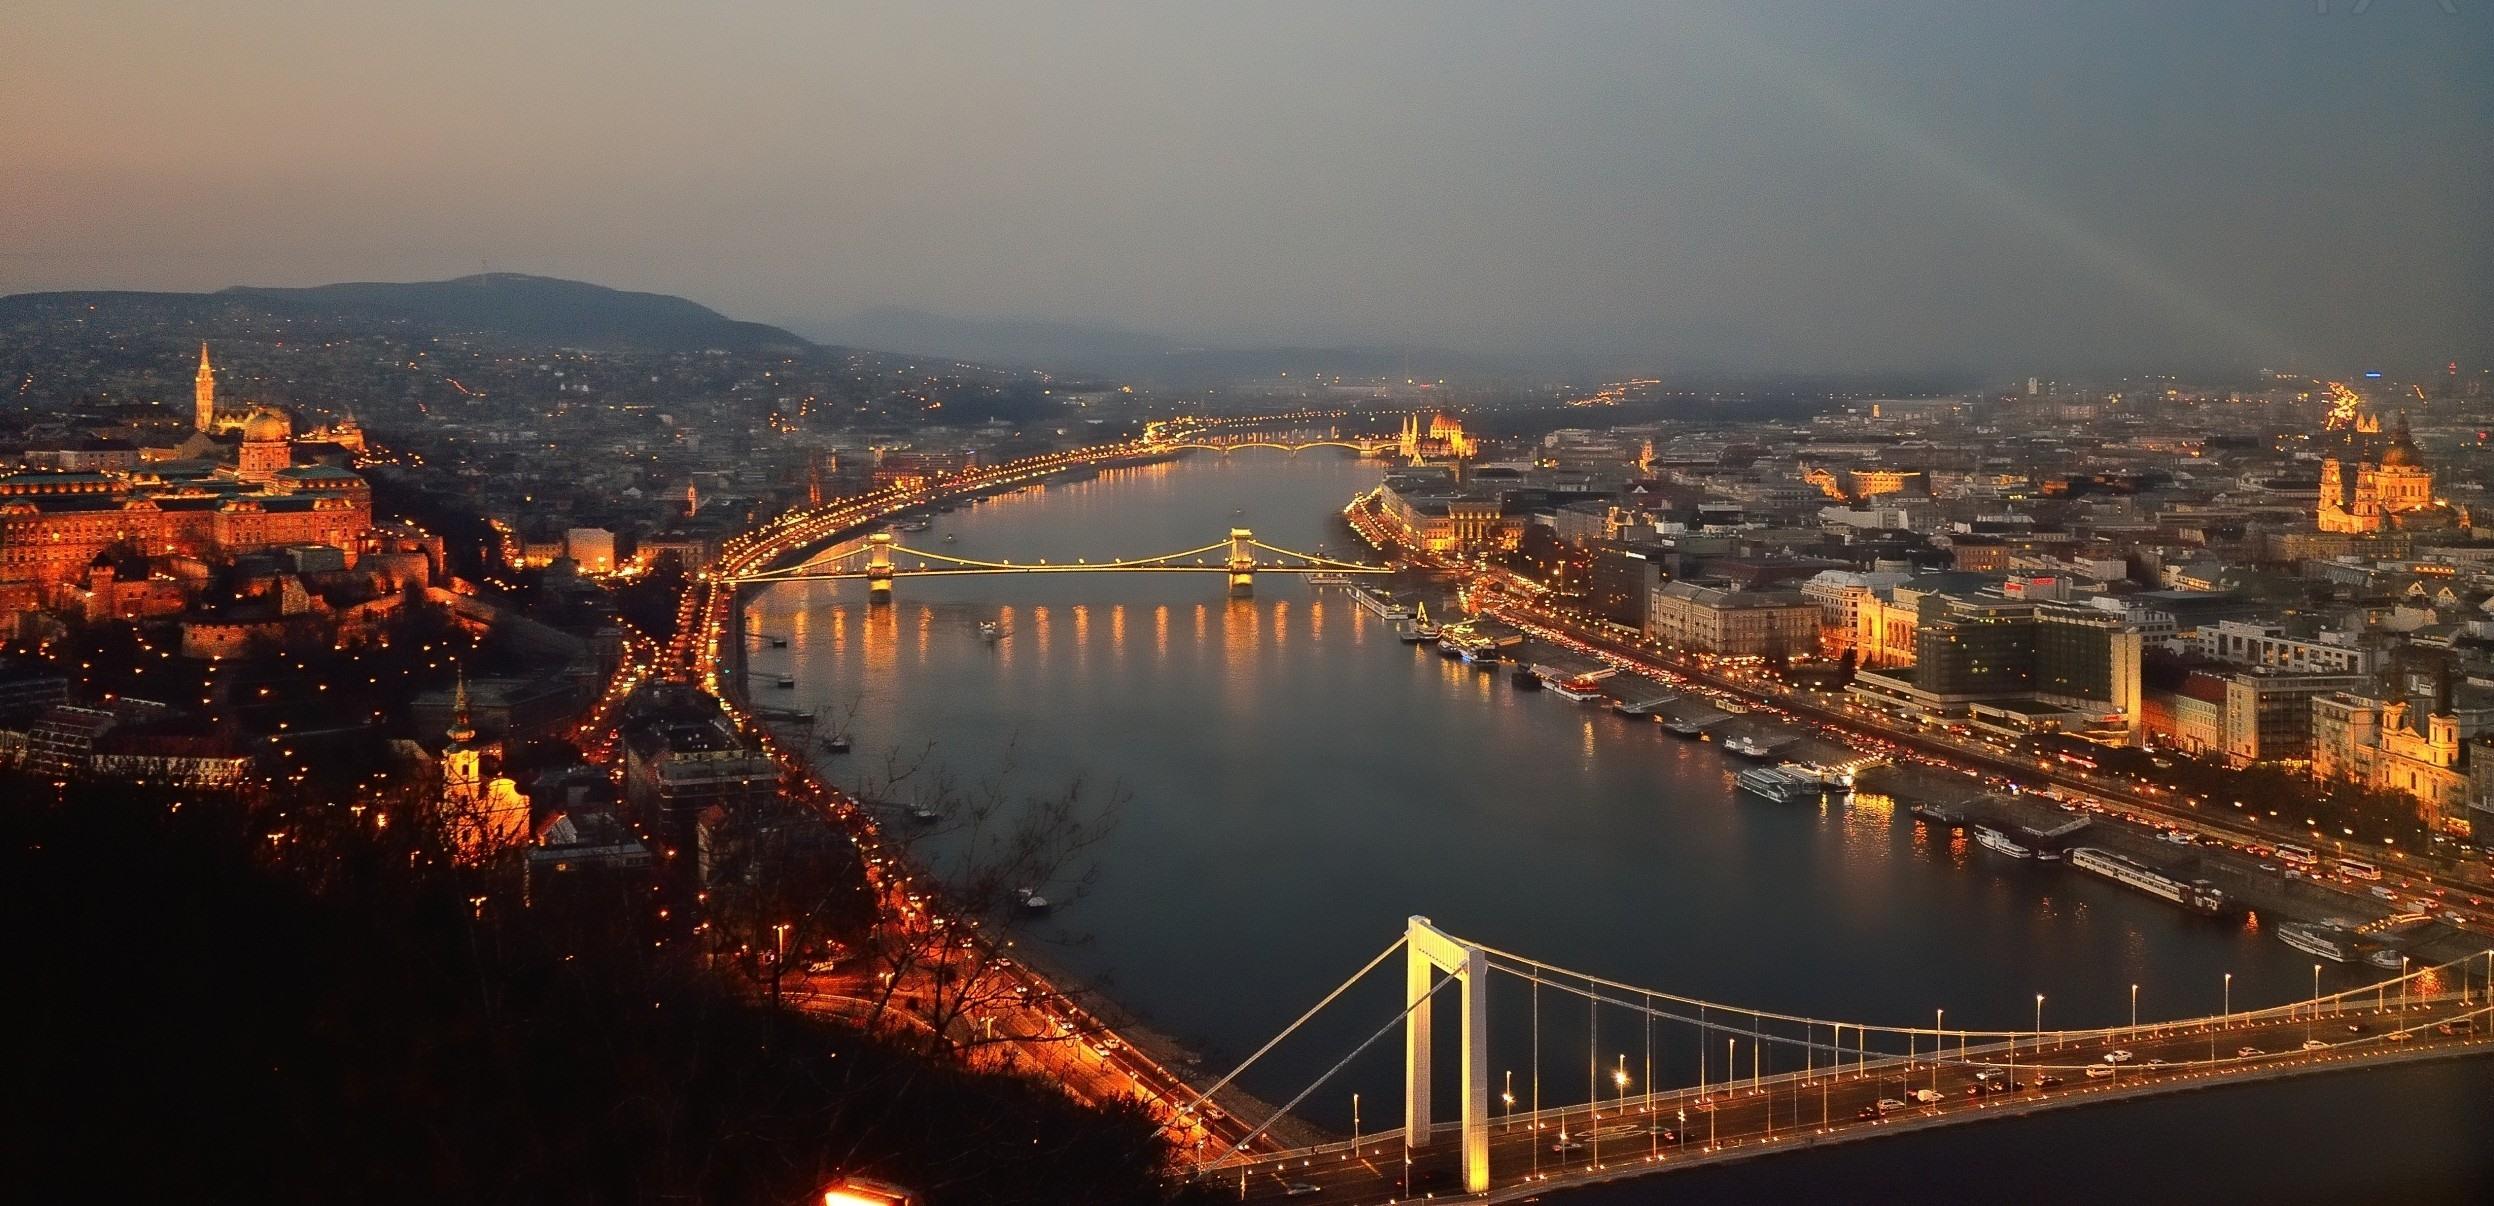 budapest_panorama.jpg